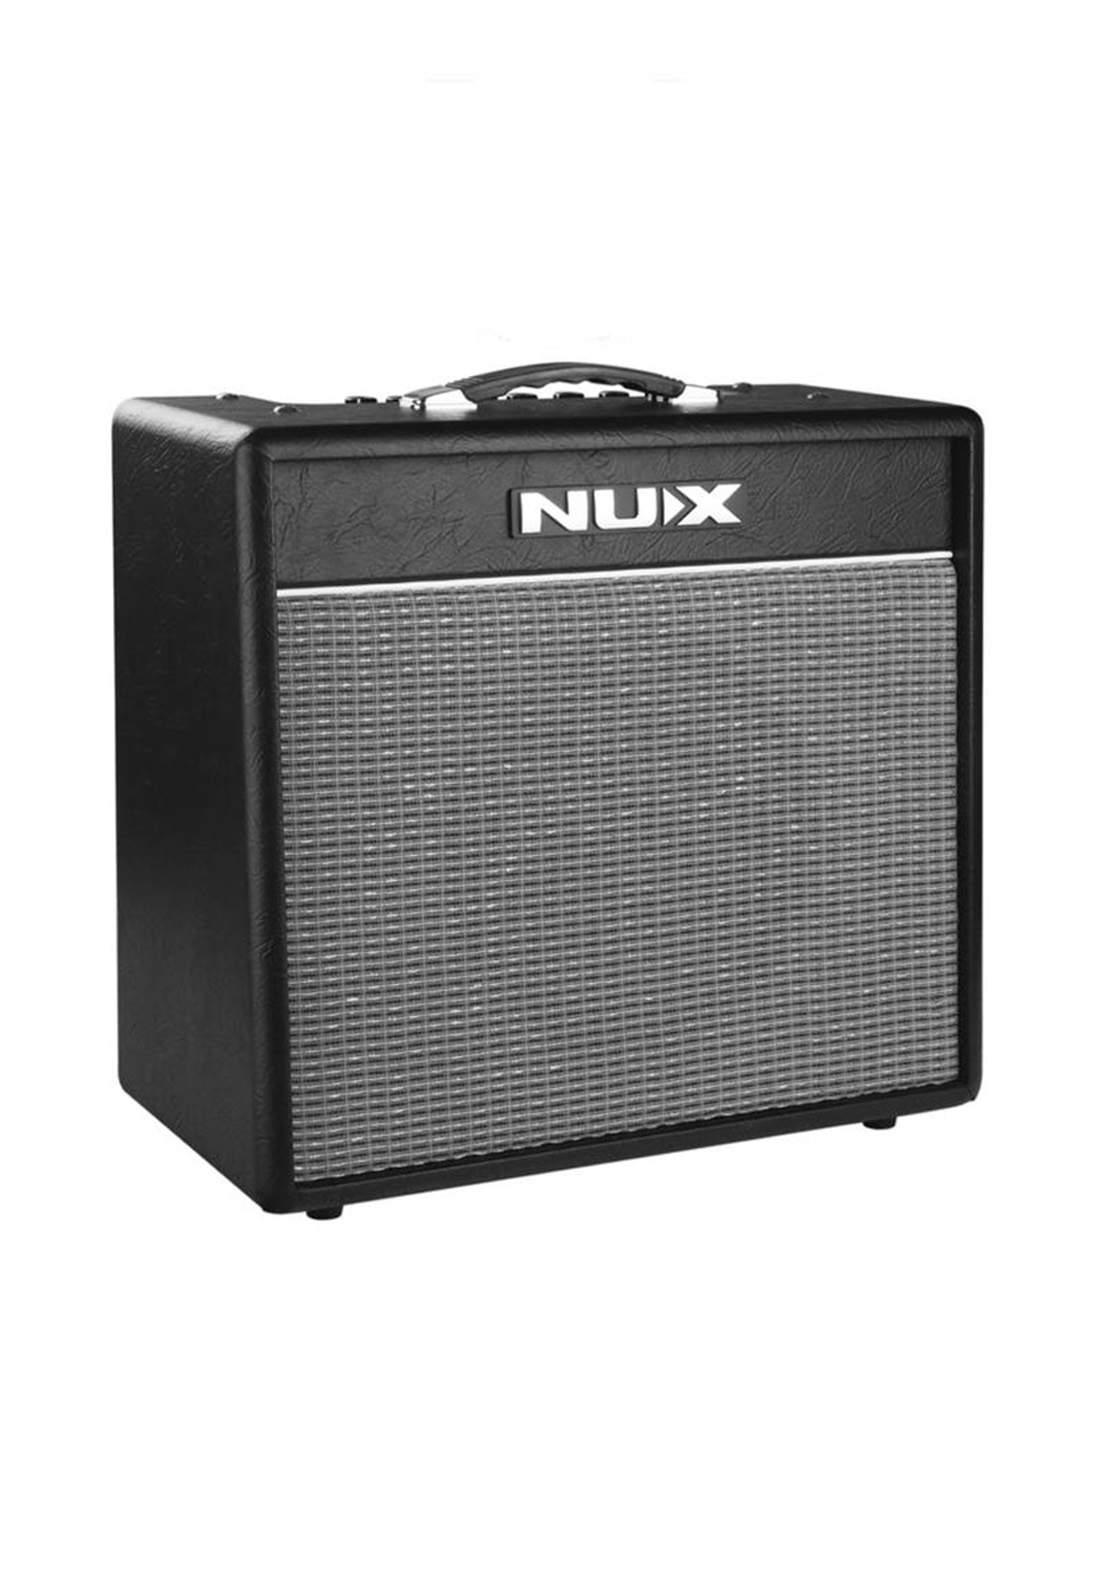 Nux Guitar Amplifier Mighty 20 Bt Series -امبليفاير جيتار